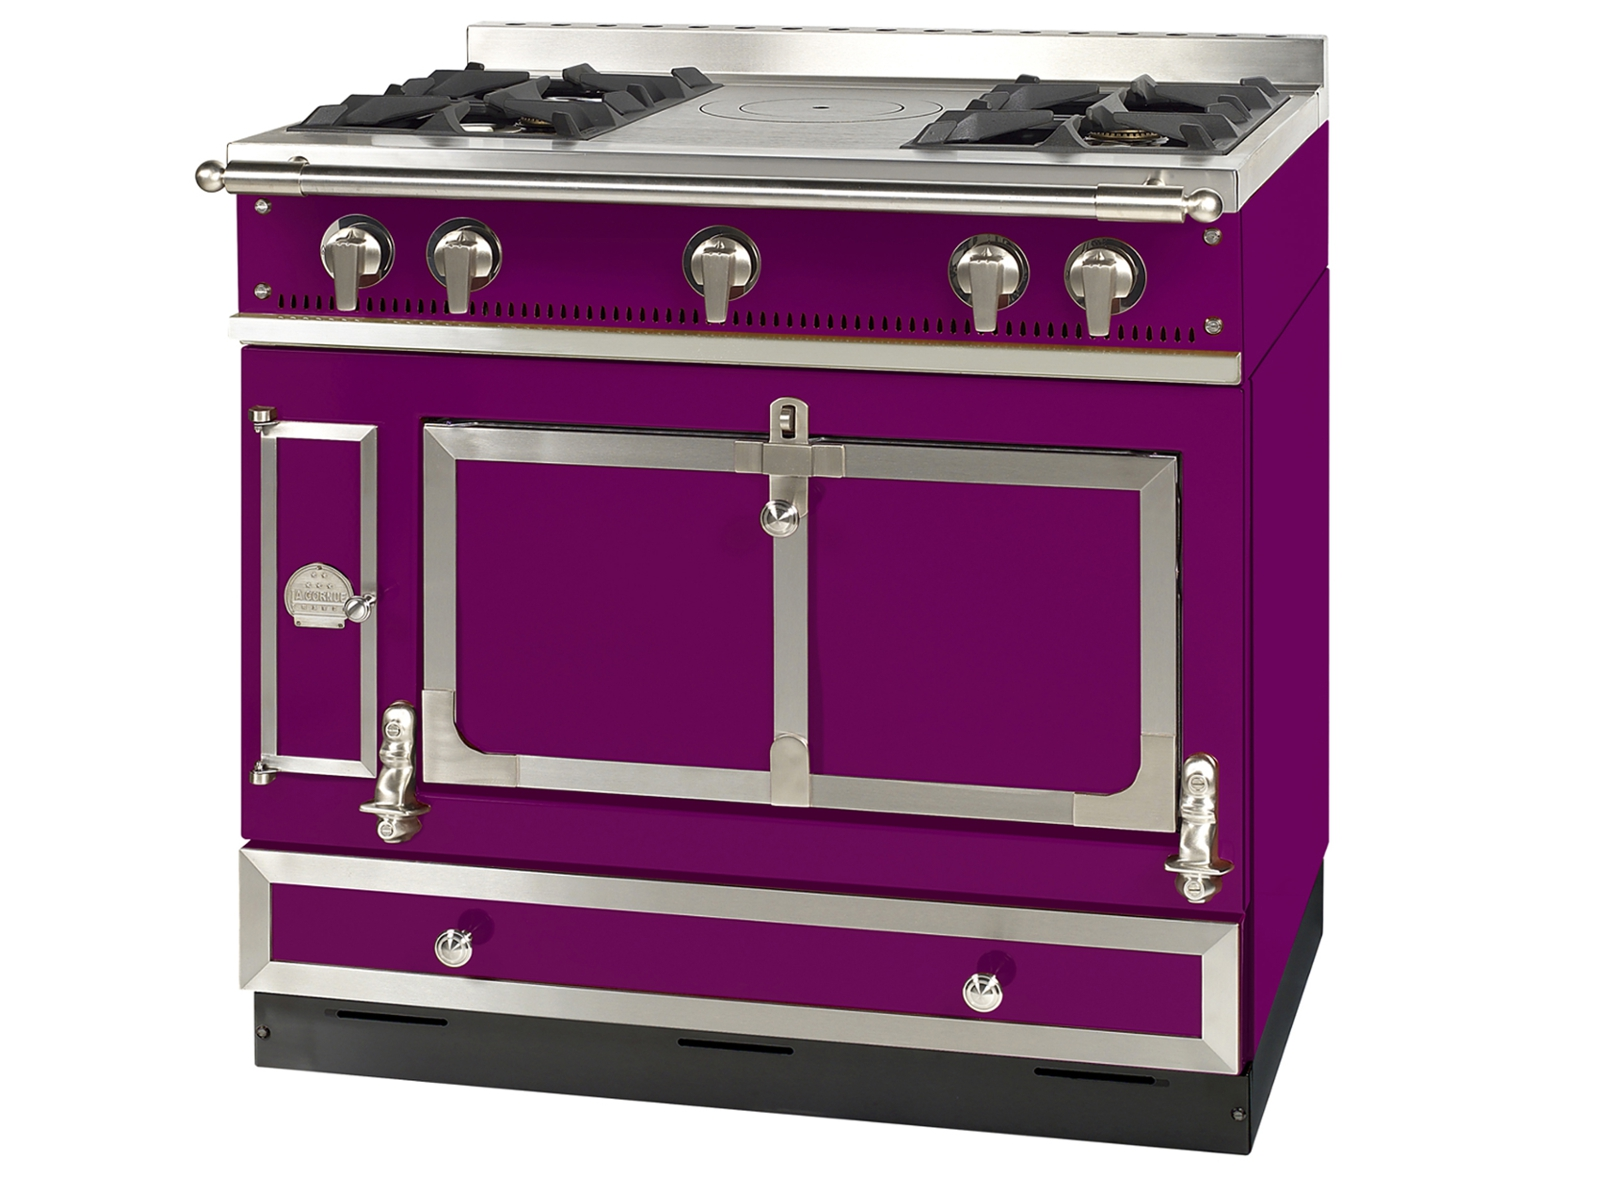 Stainless steel cooker grand castel 90 by la cornue - La cornue chateau 90 ...